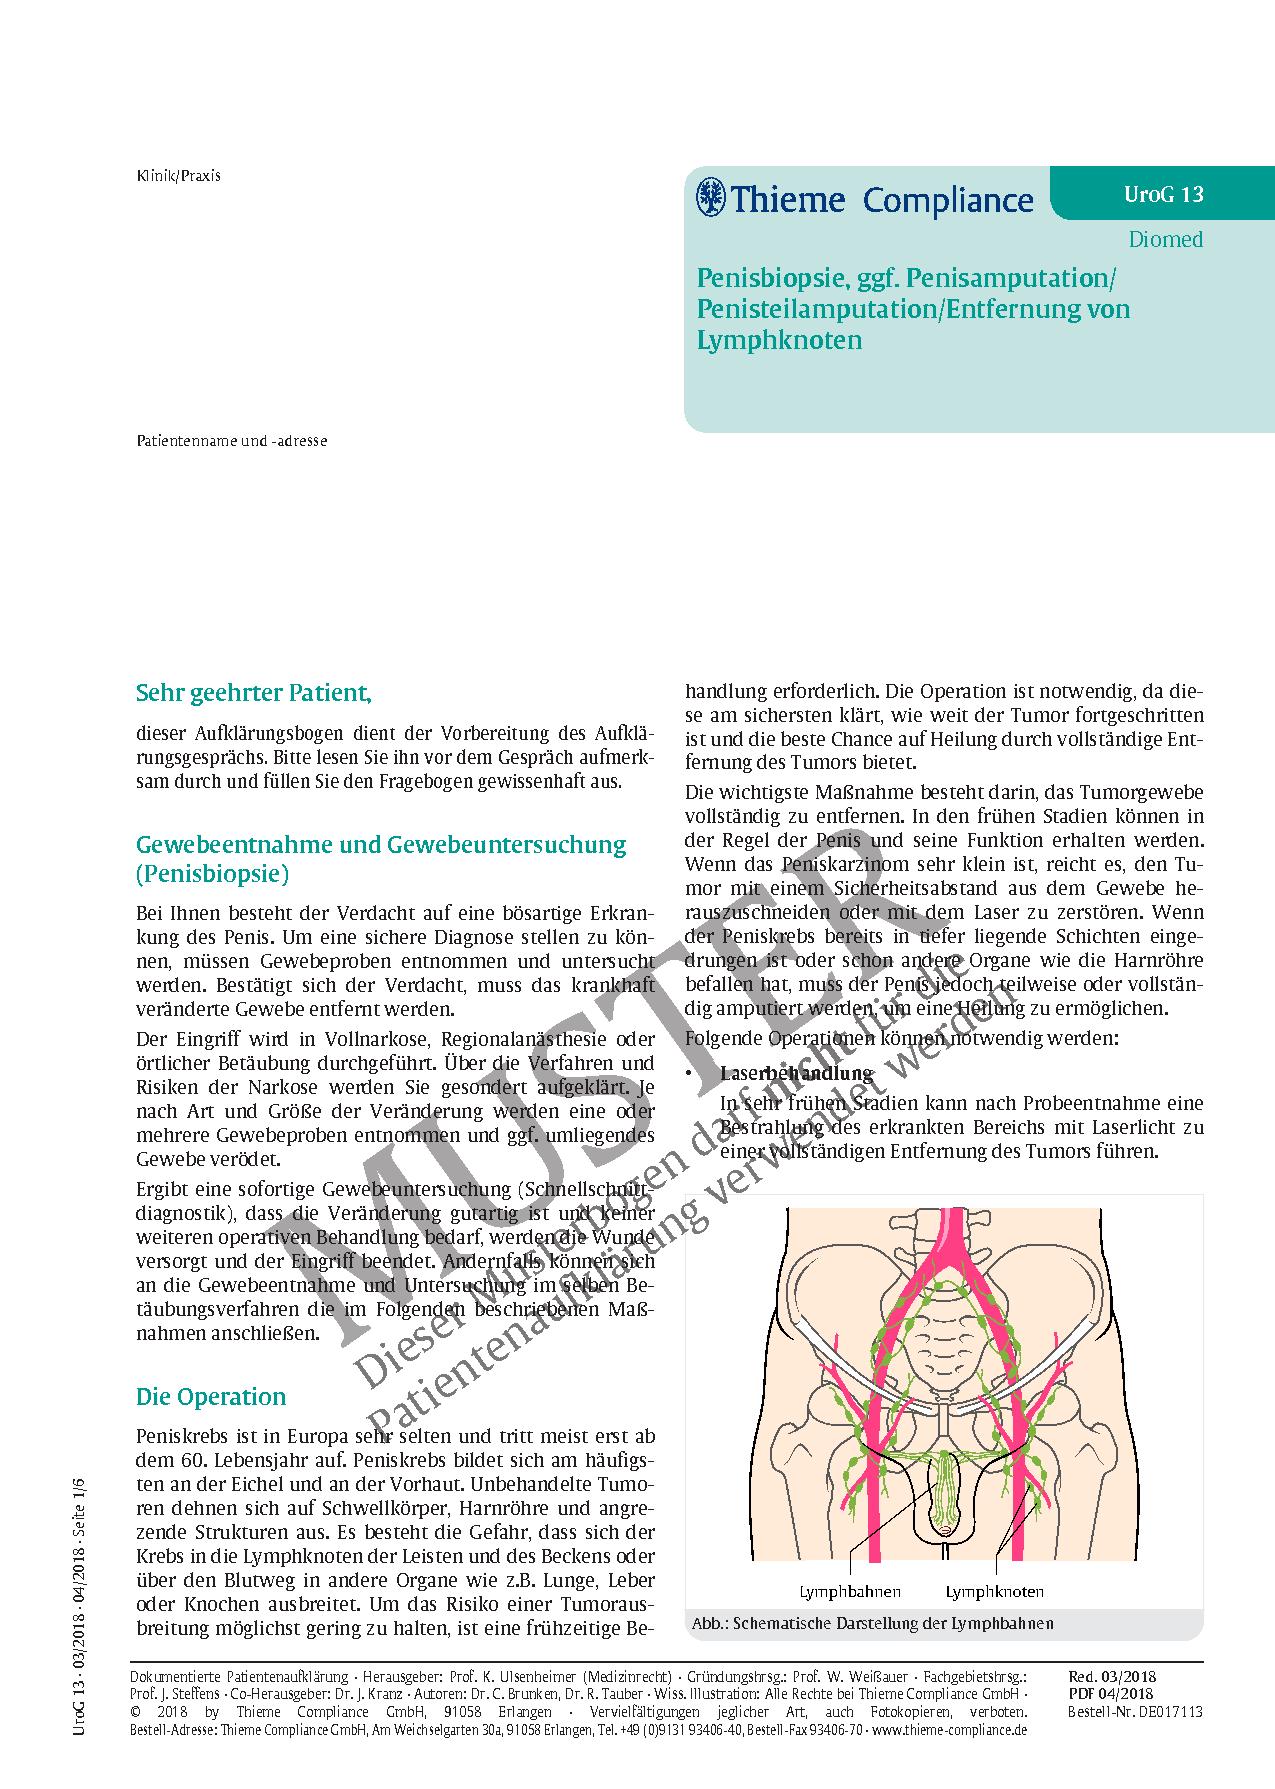 Fantastisch Männlich Lymphknoten Ideen - Anatomie Ideen - finotti.info